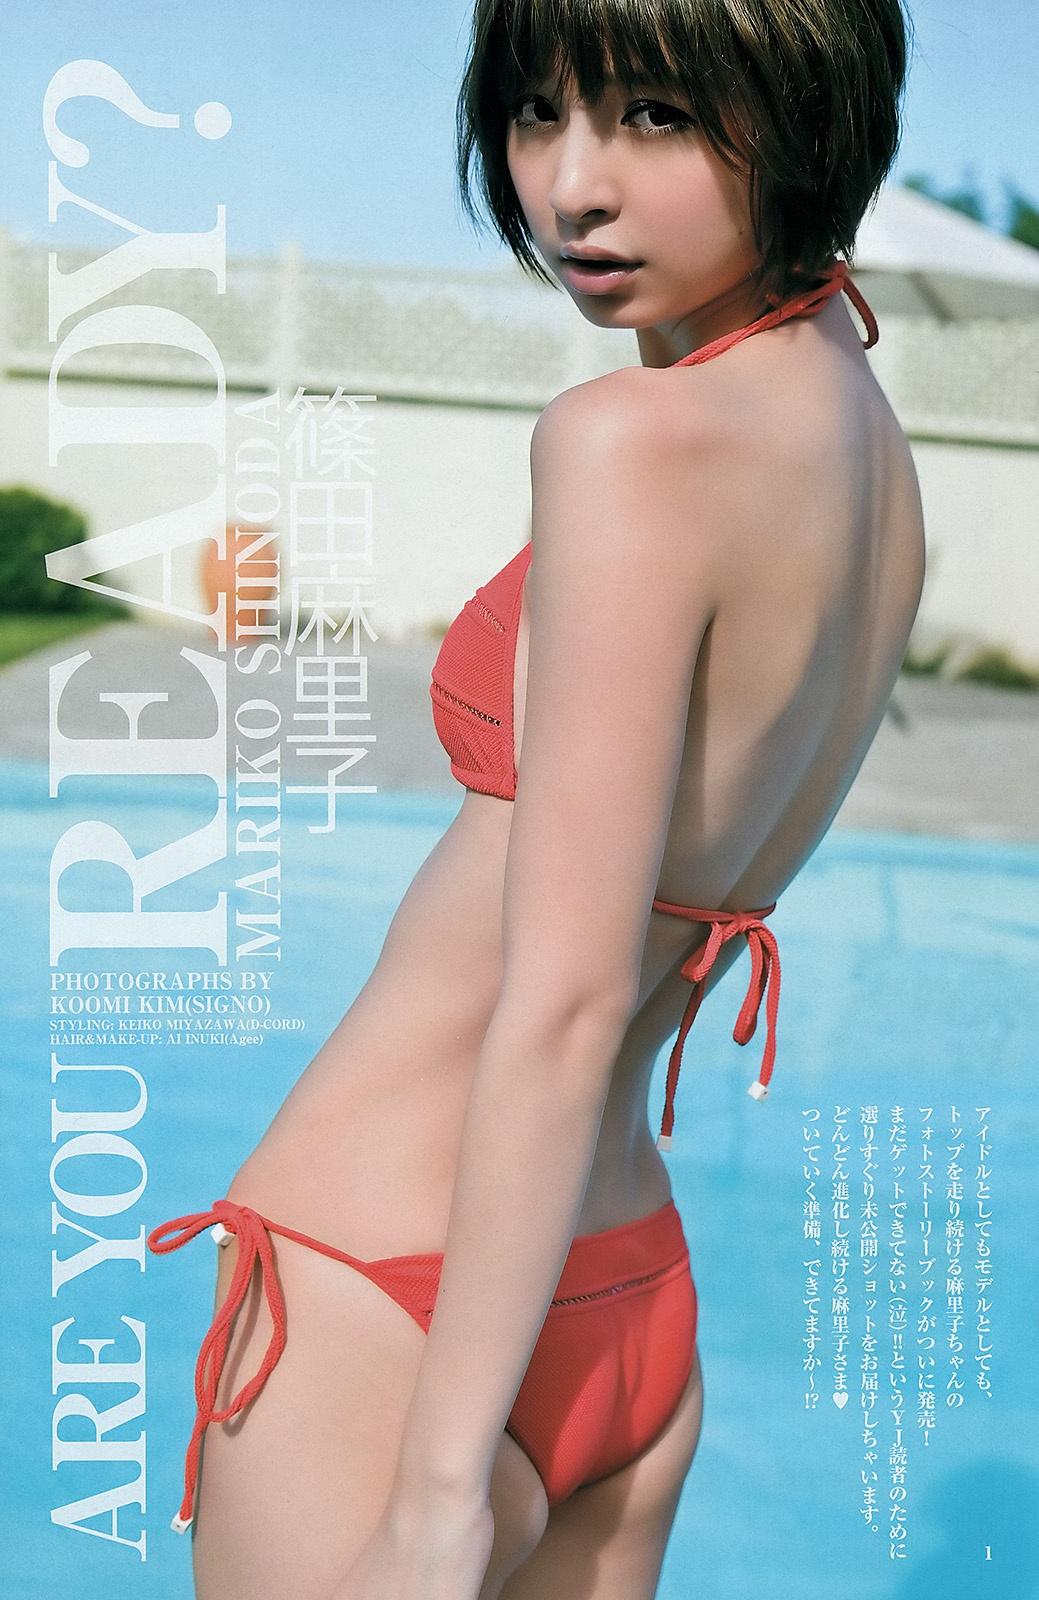 Mariko Shinoda Android Iphone Wallpaper 38511 Asiachan